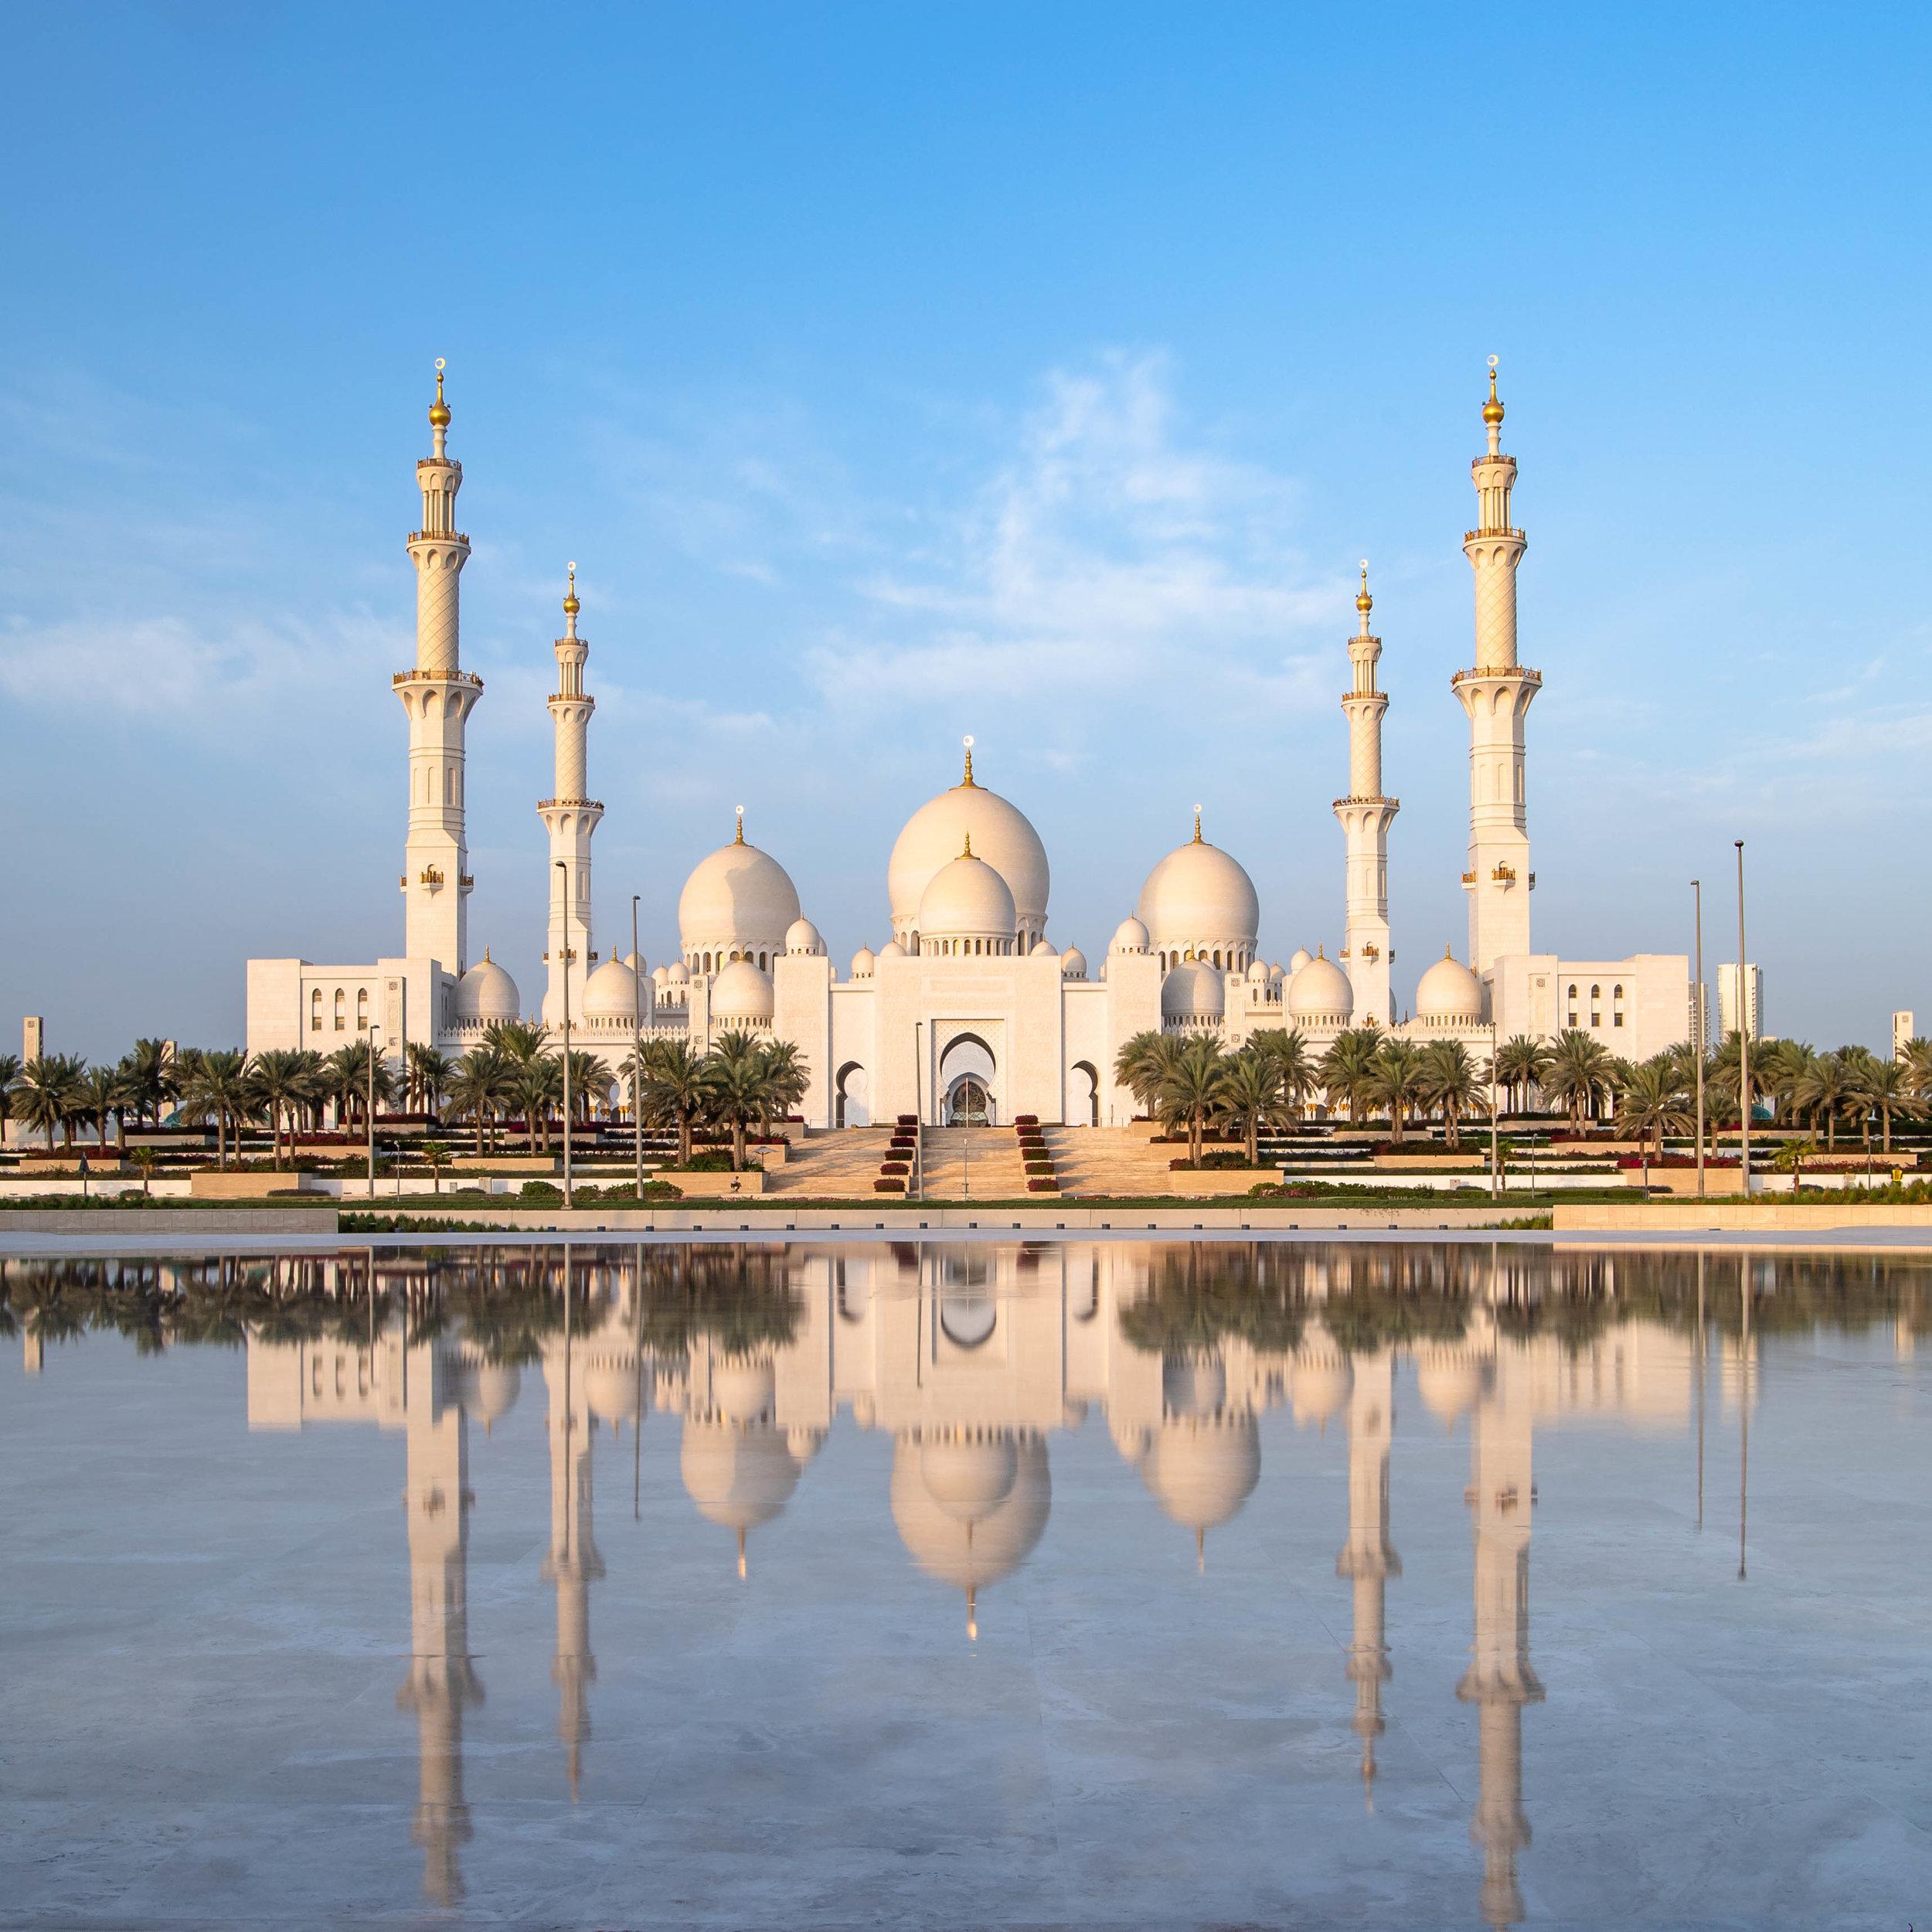 Grand Mosque seen from Wahat Al Karama